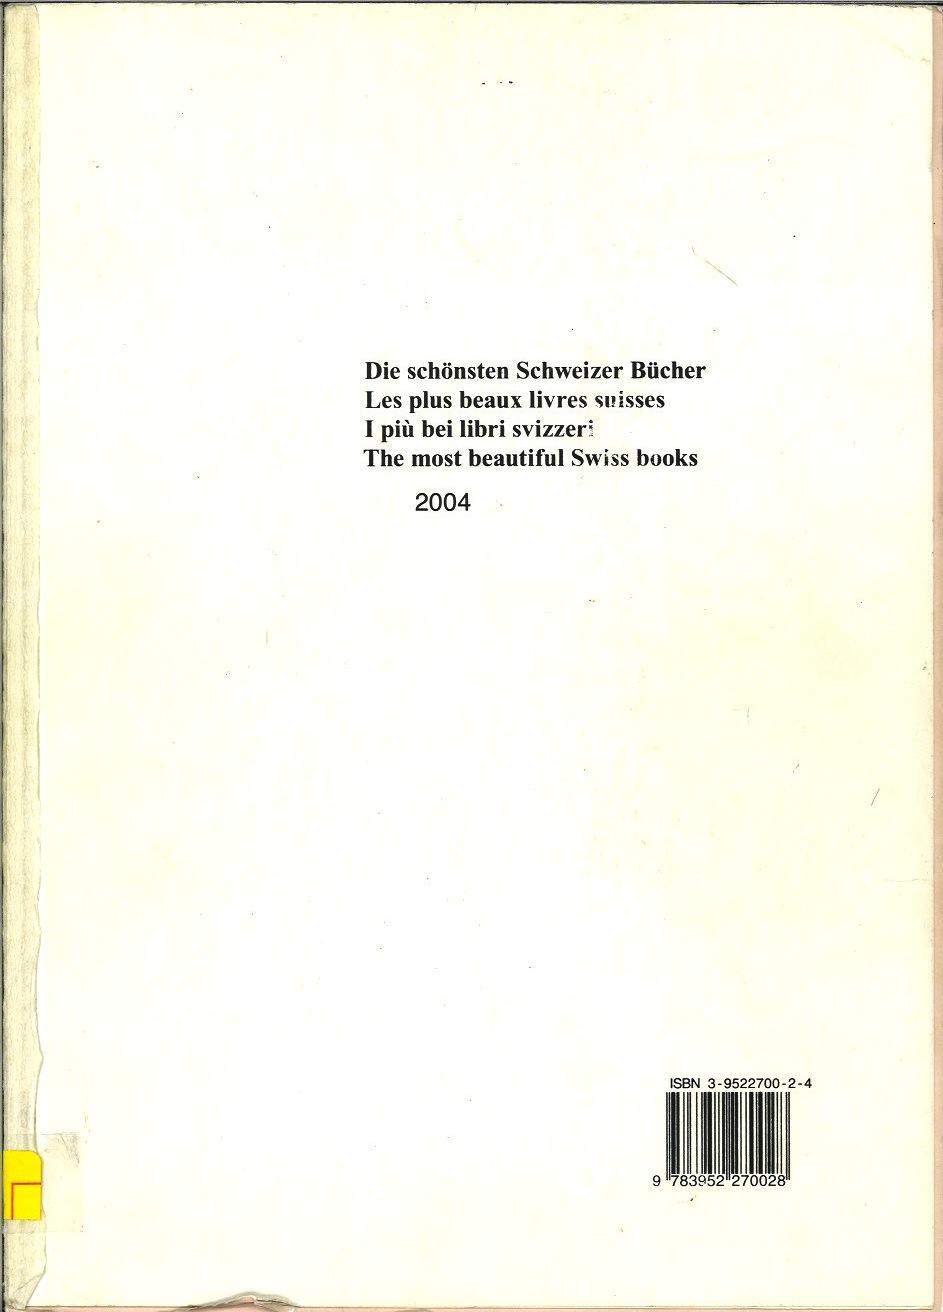 The most beautiful Swiss books. 2004